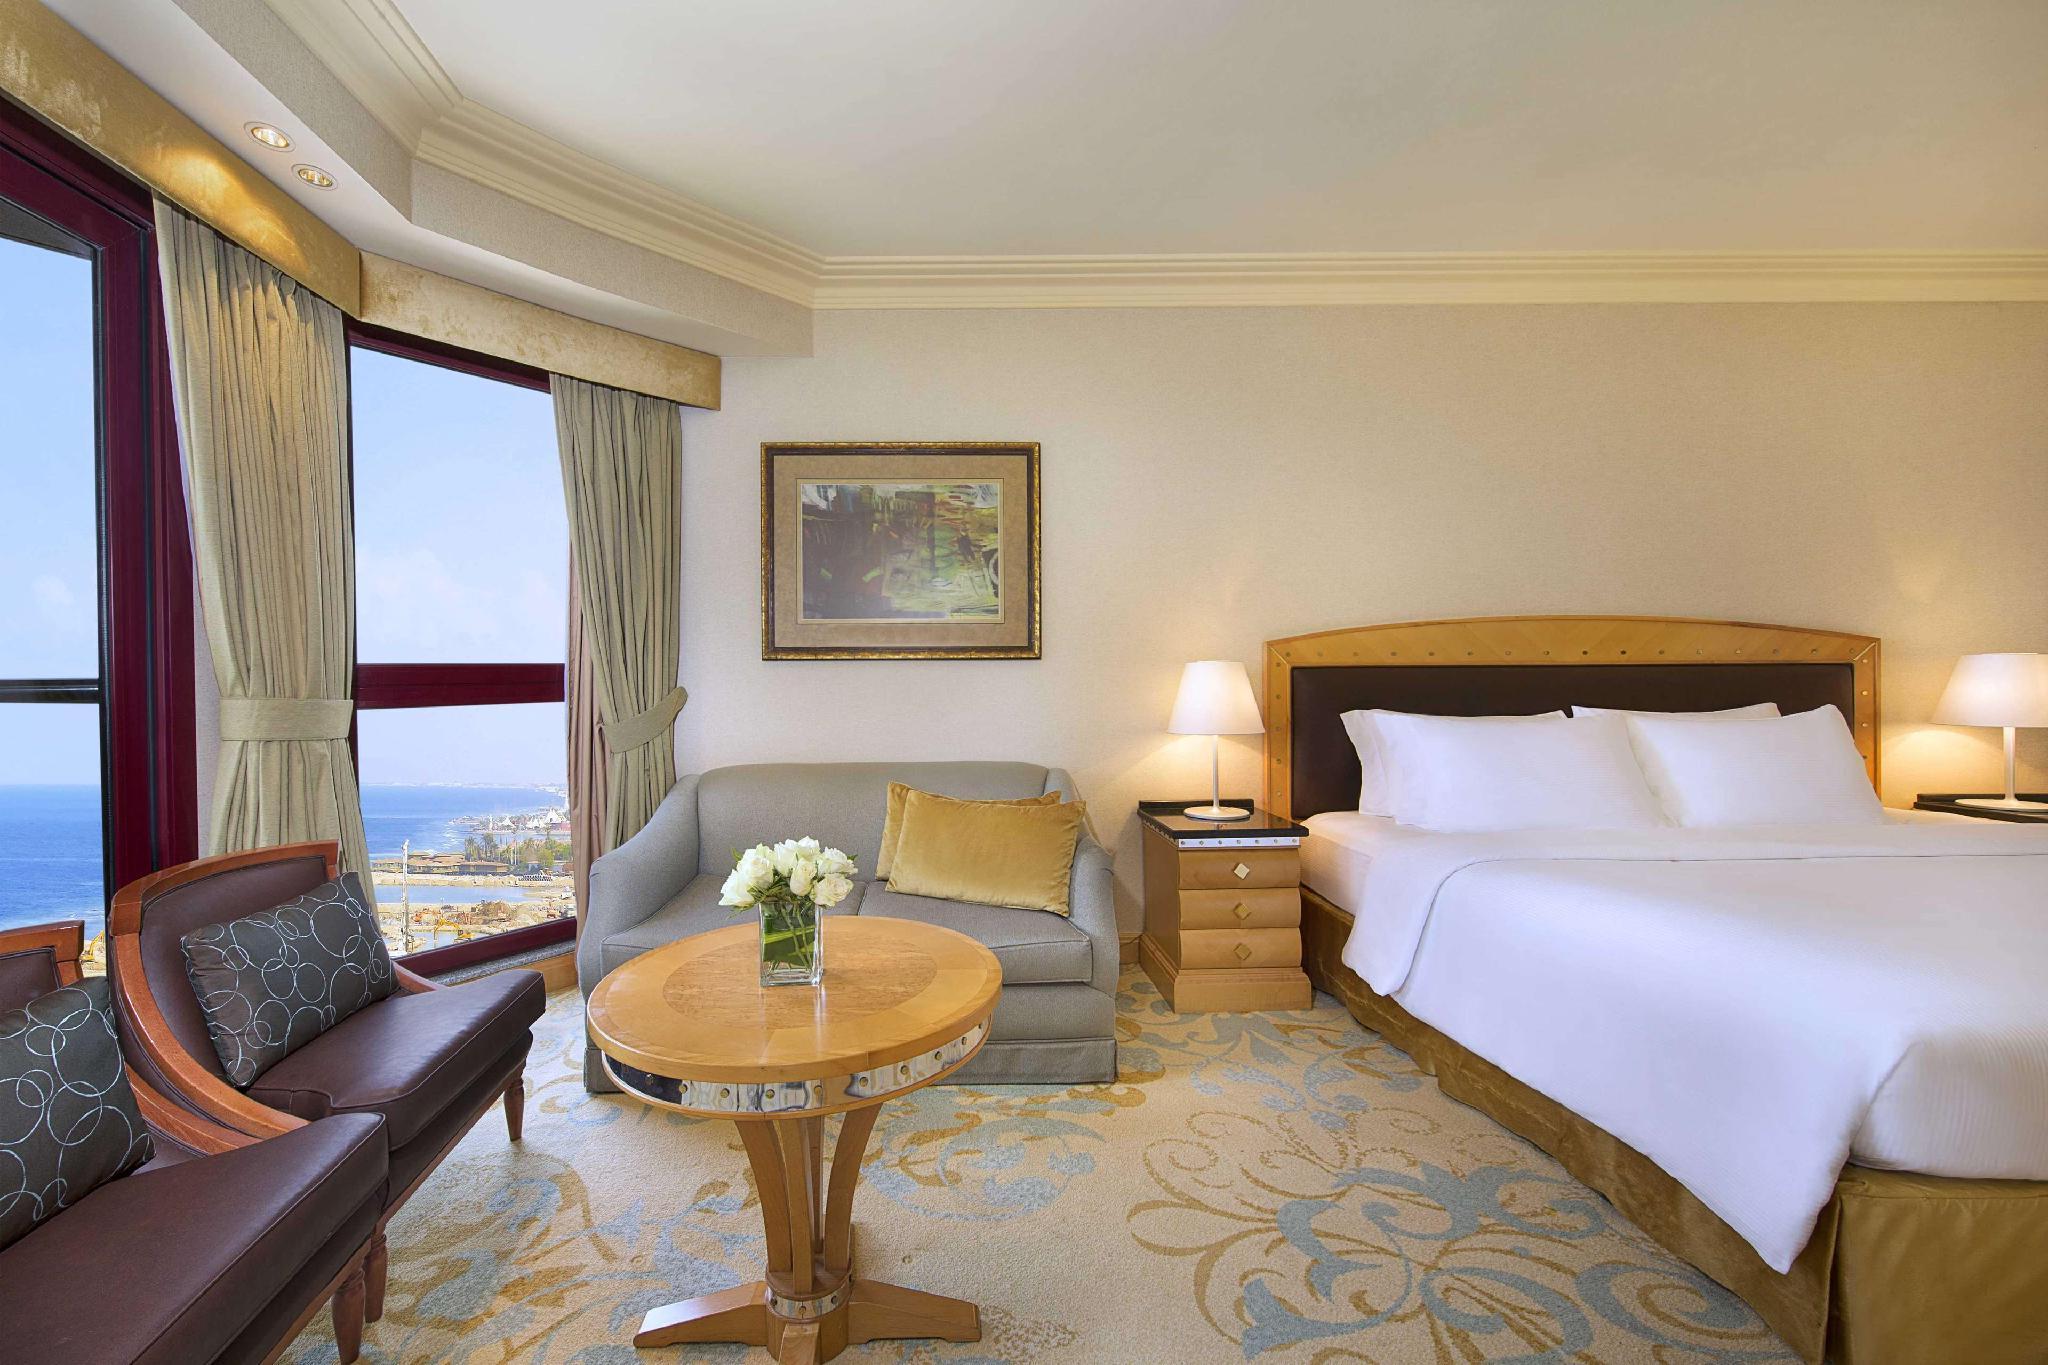 Jeddah Hilton In Jeddah Hotel Rates Reviews On Orbitz 8